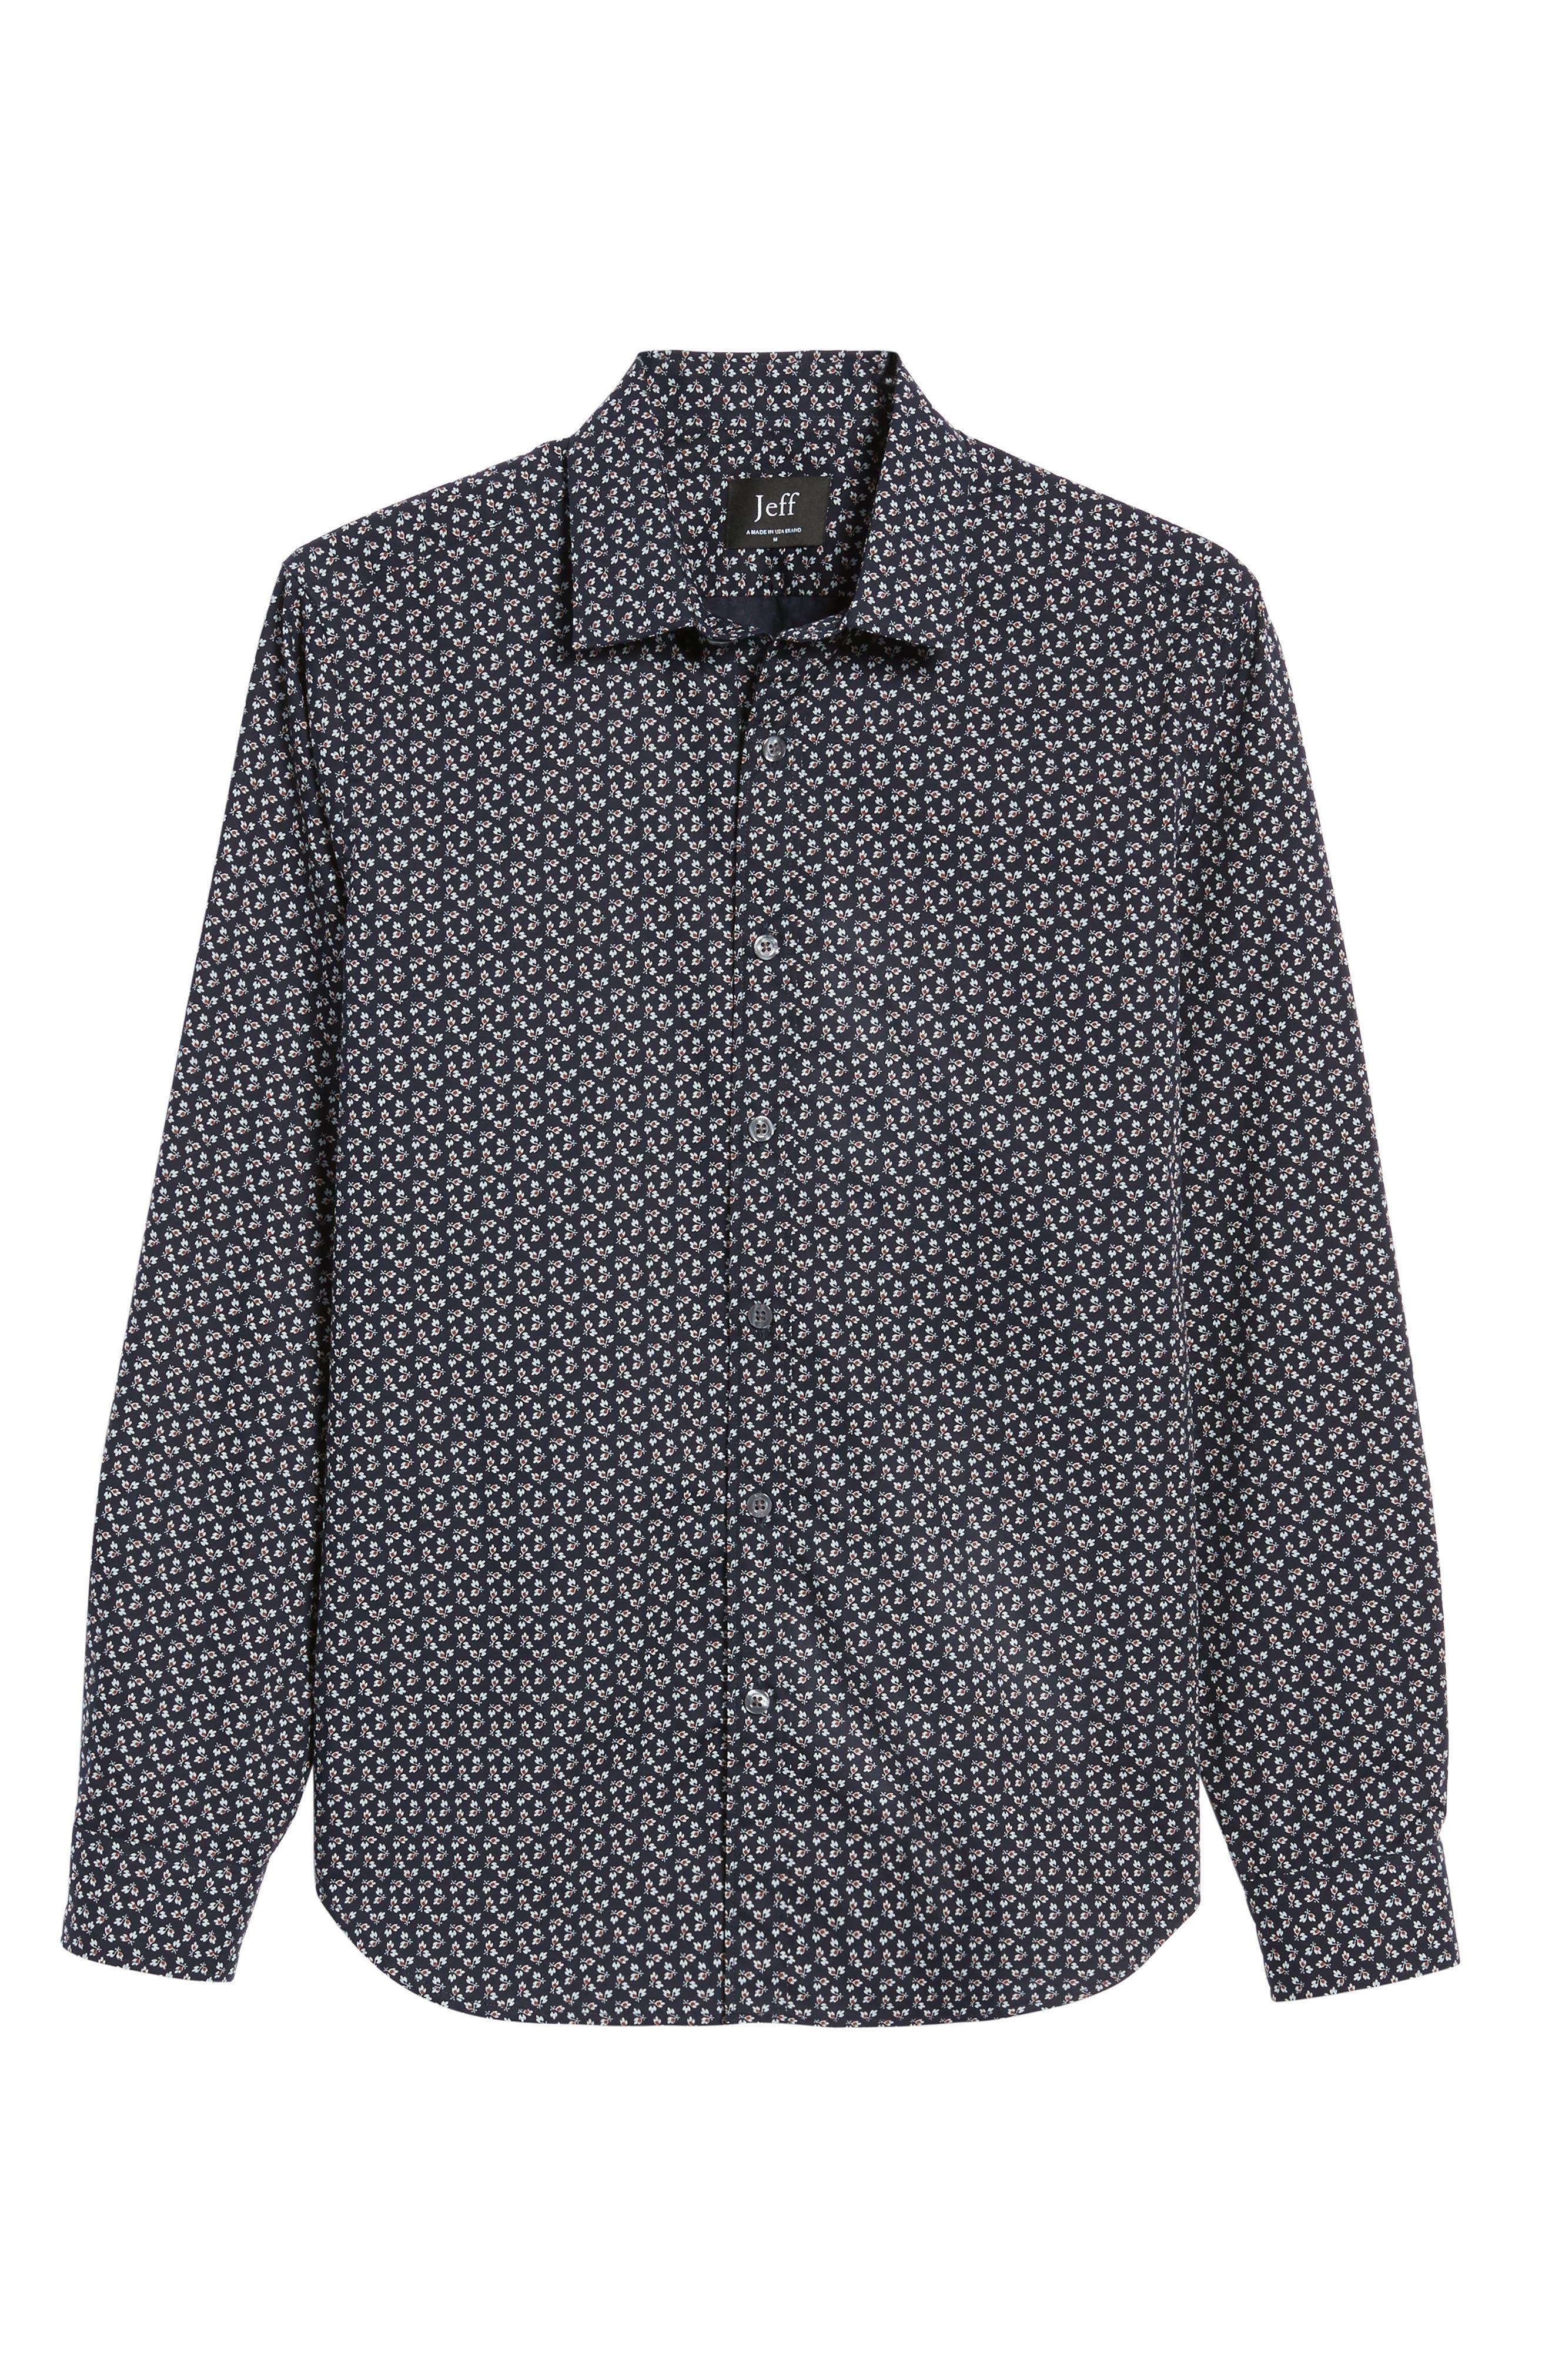 Alternate Image 5  - Jeff Slim Fit Floral Print Sport Shirt